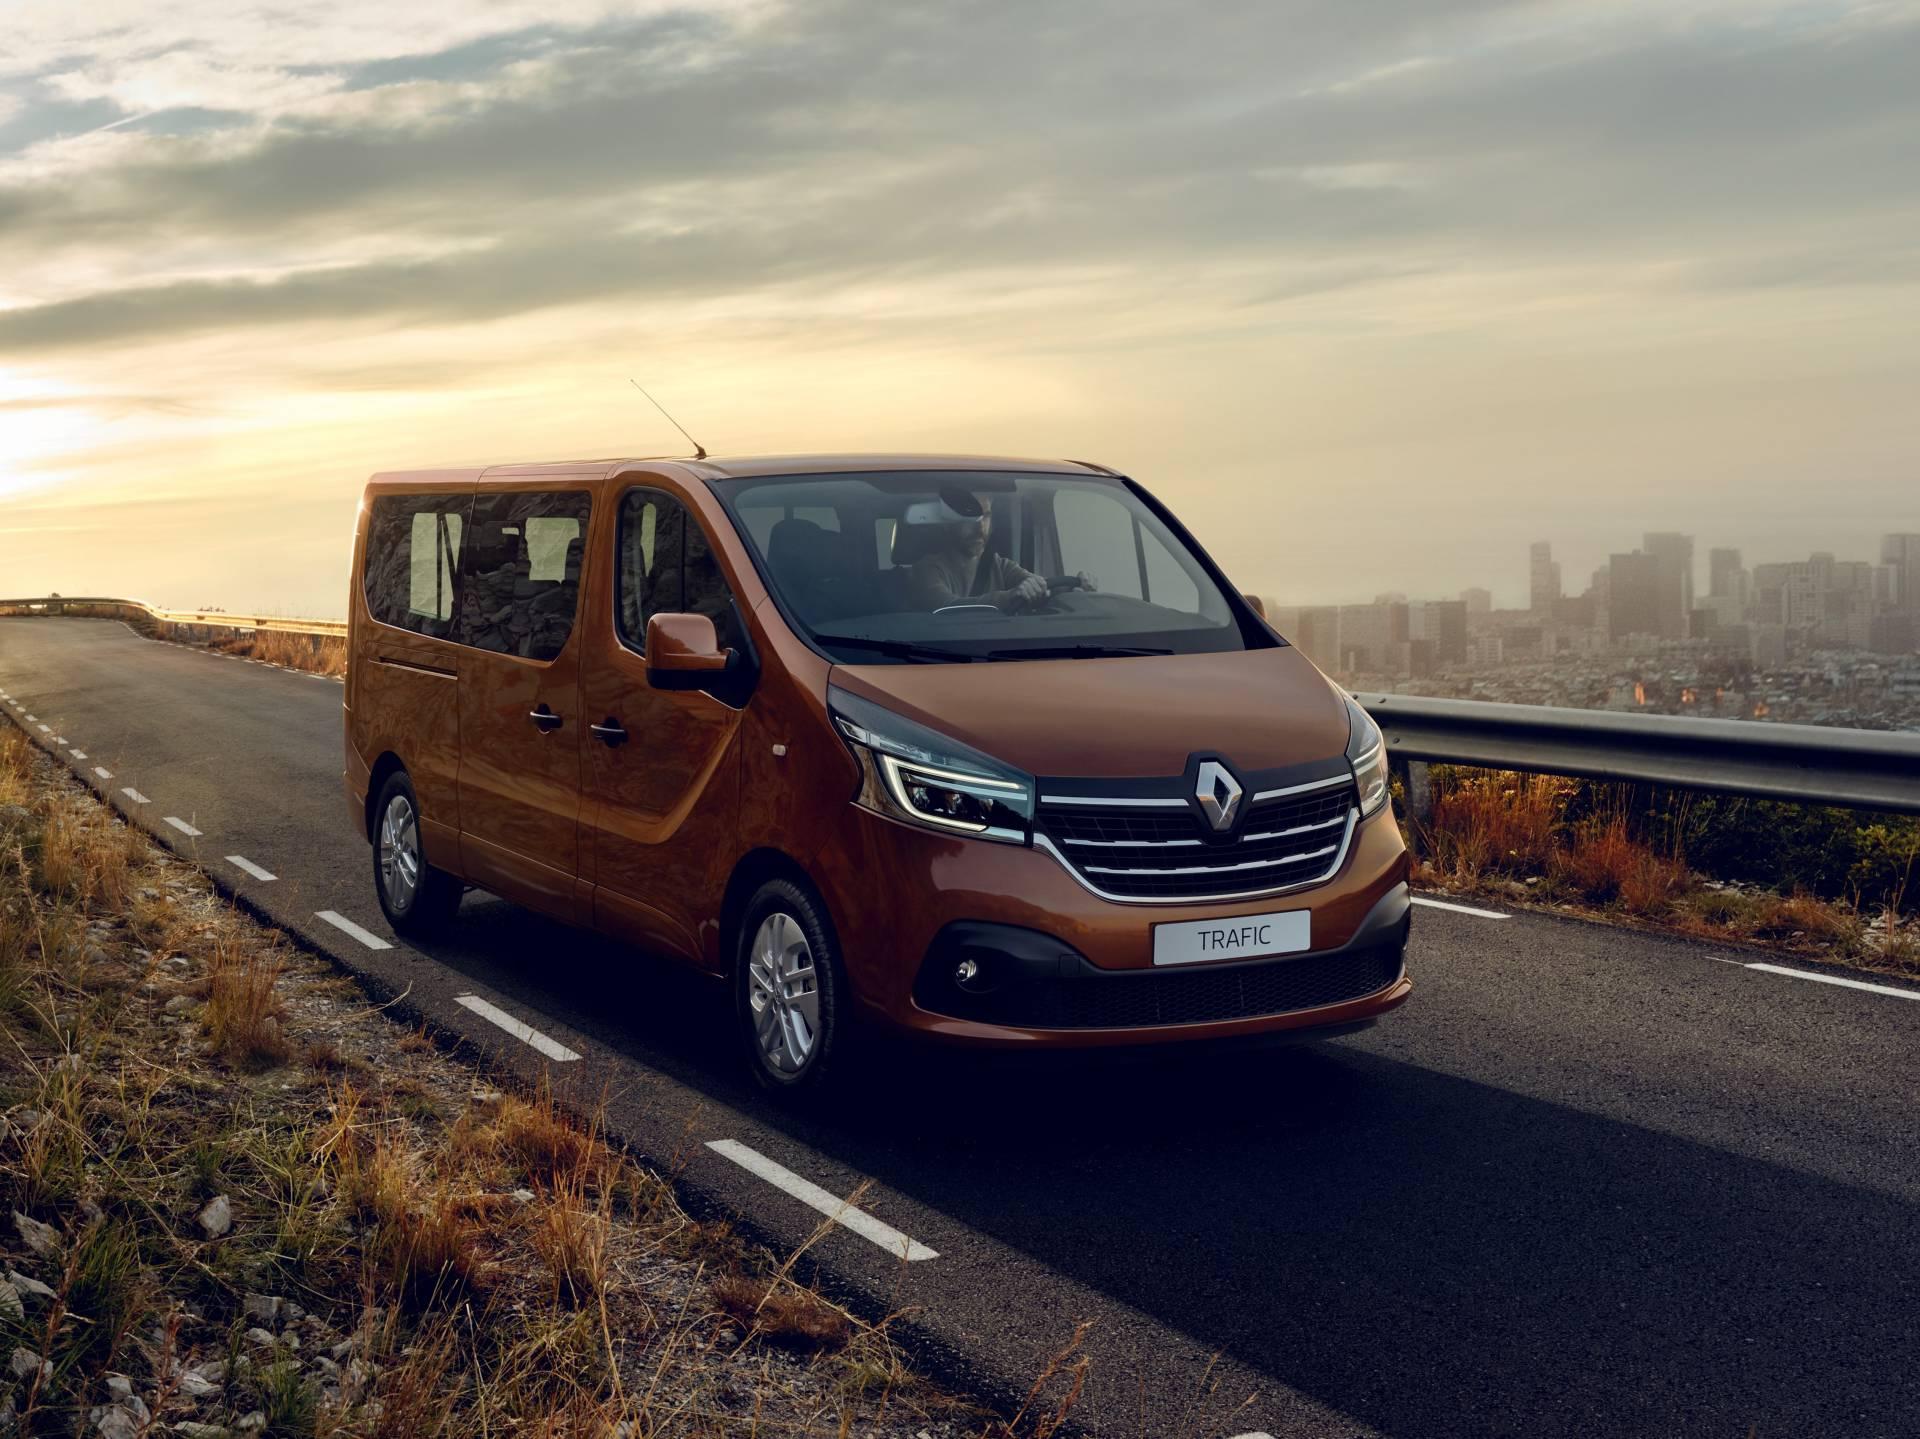 cd9ac9cf-2019my-renault-trafic-van-facelift-25